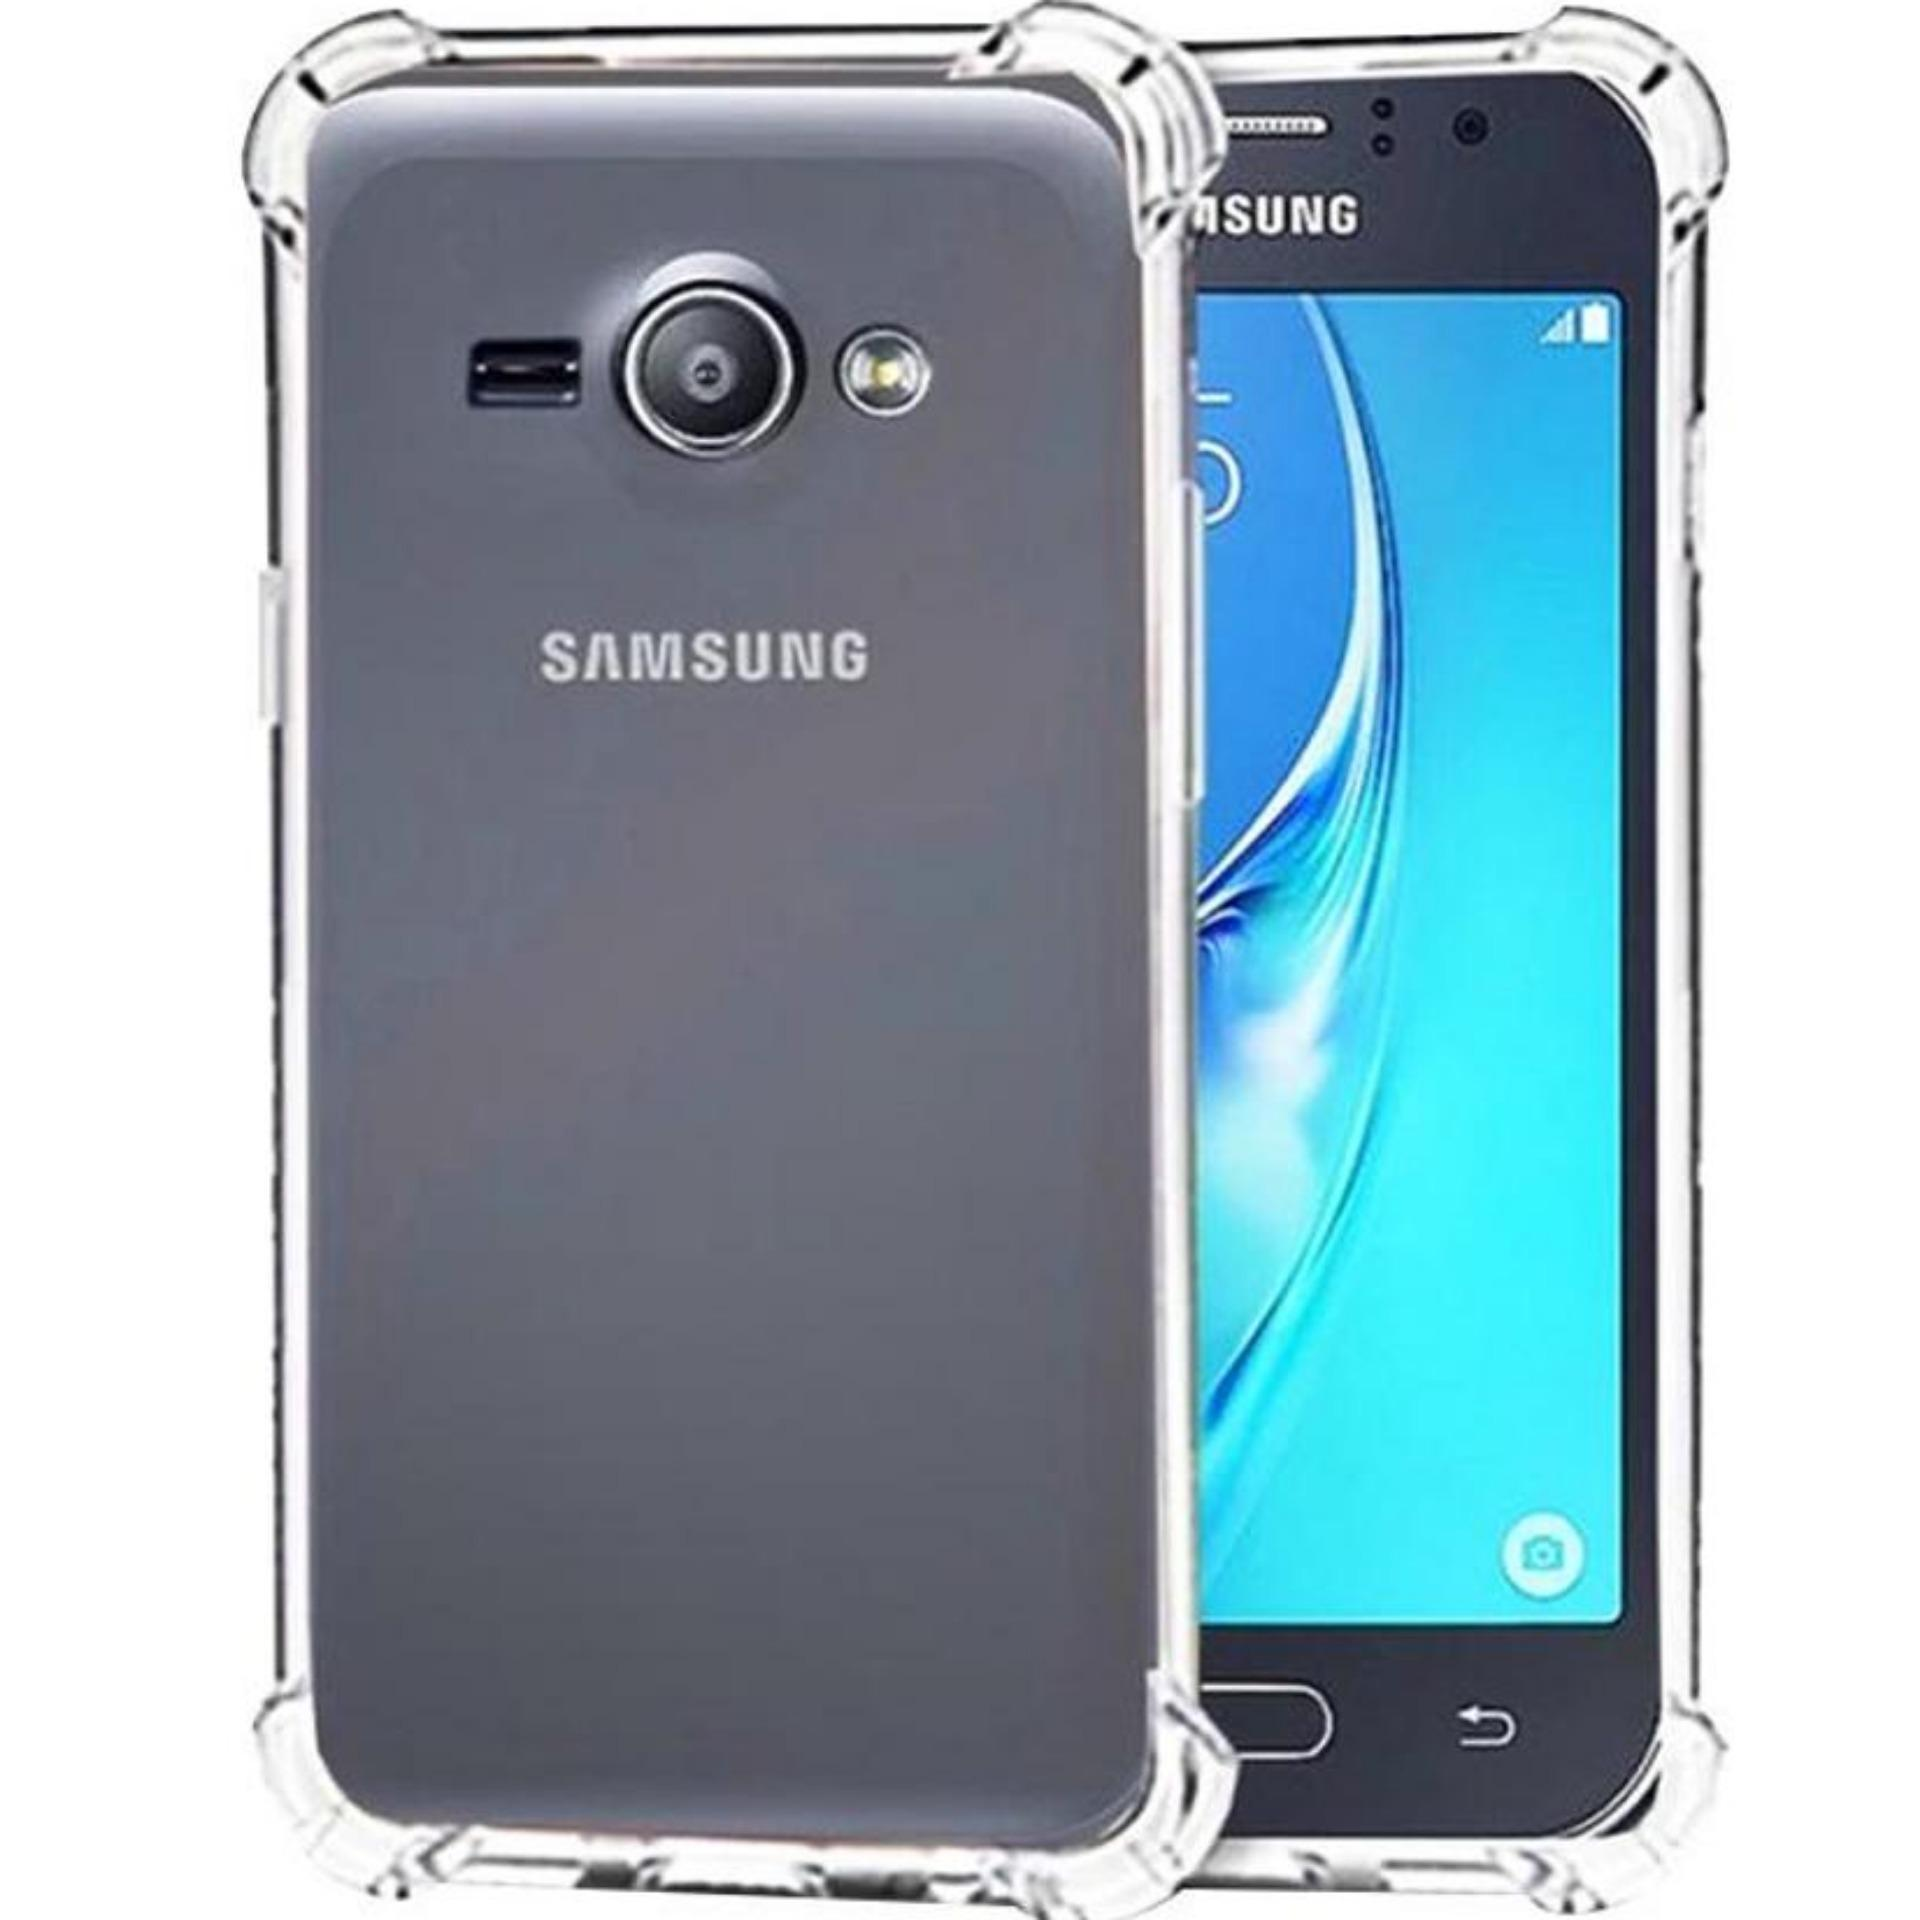 ShockCase for Samsung Galaxy J1 (2015) / J100 / 4G LTE / Duos | Premium Softcase Jelly Anti Crack S